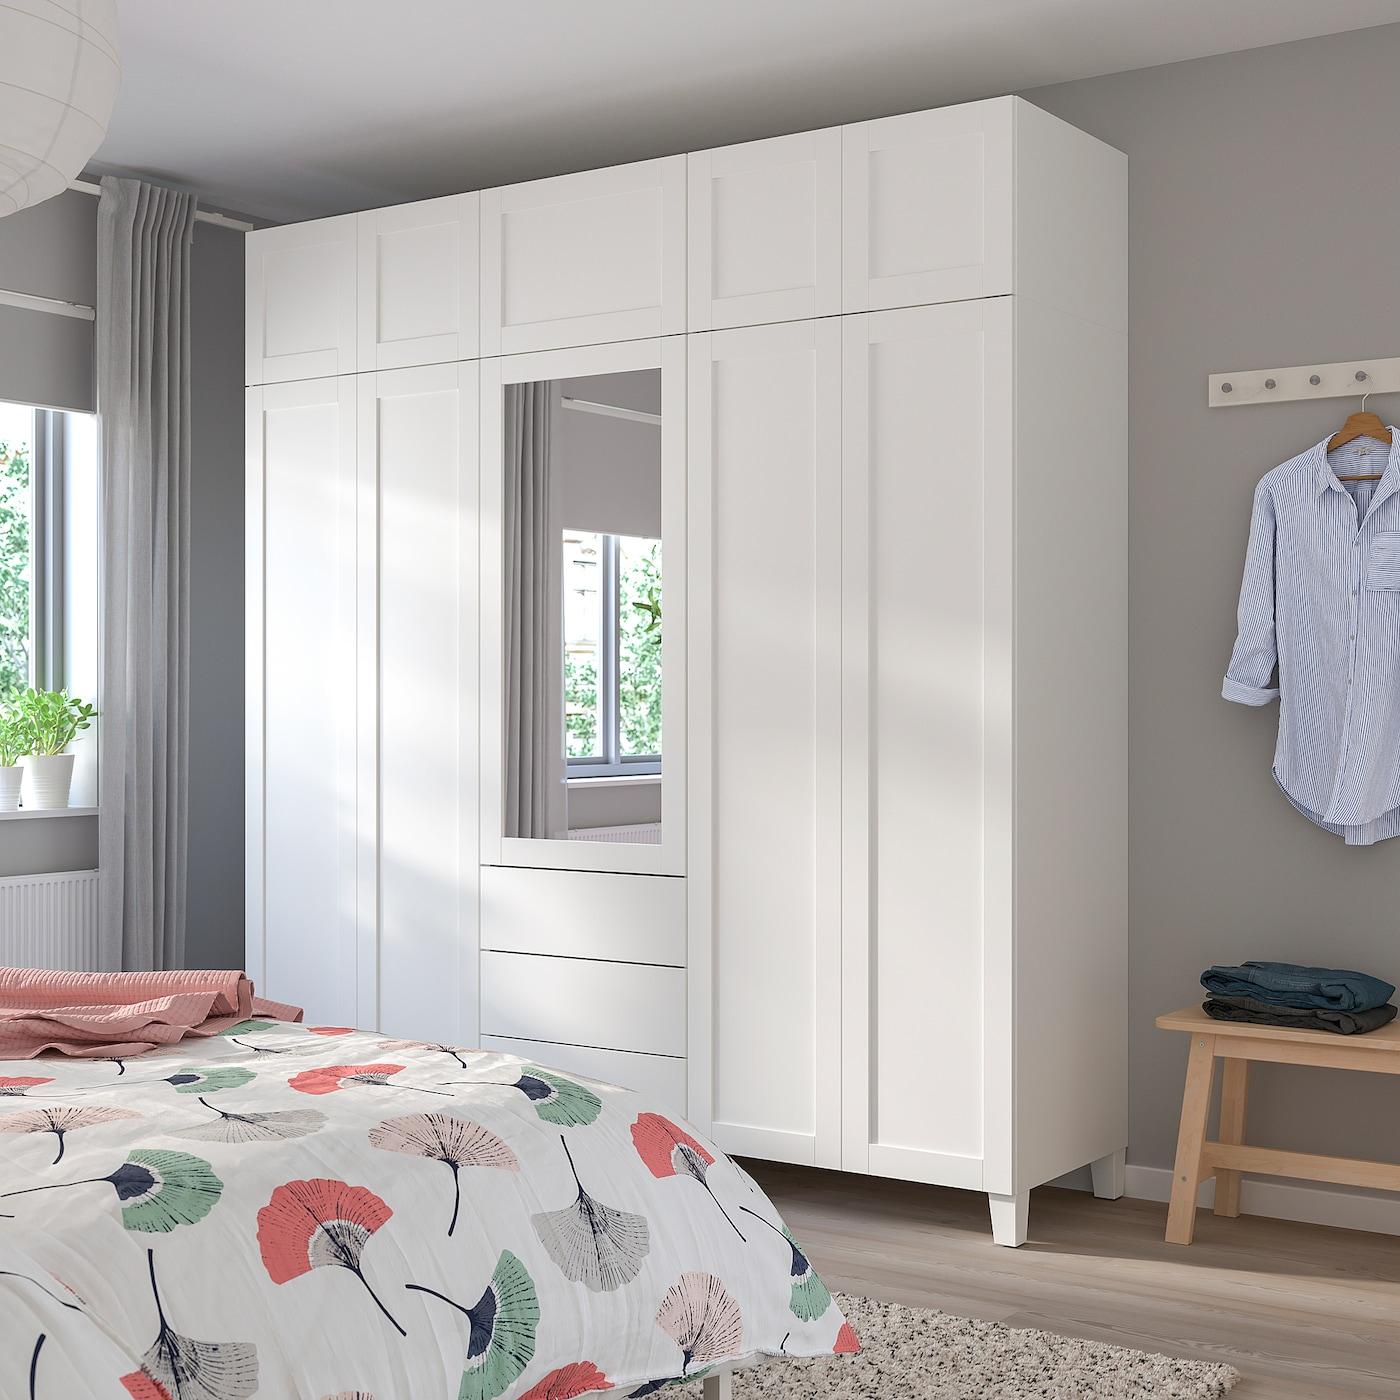 PLATSA 普拉萨 衣柜, 白色/桑尼达尔 里达布, 220x57x231 厘米